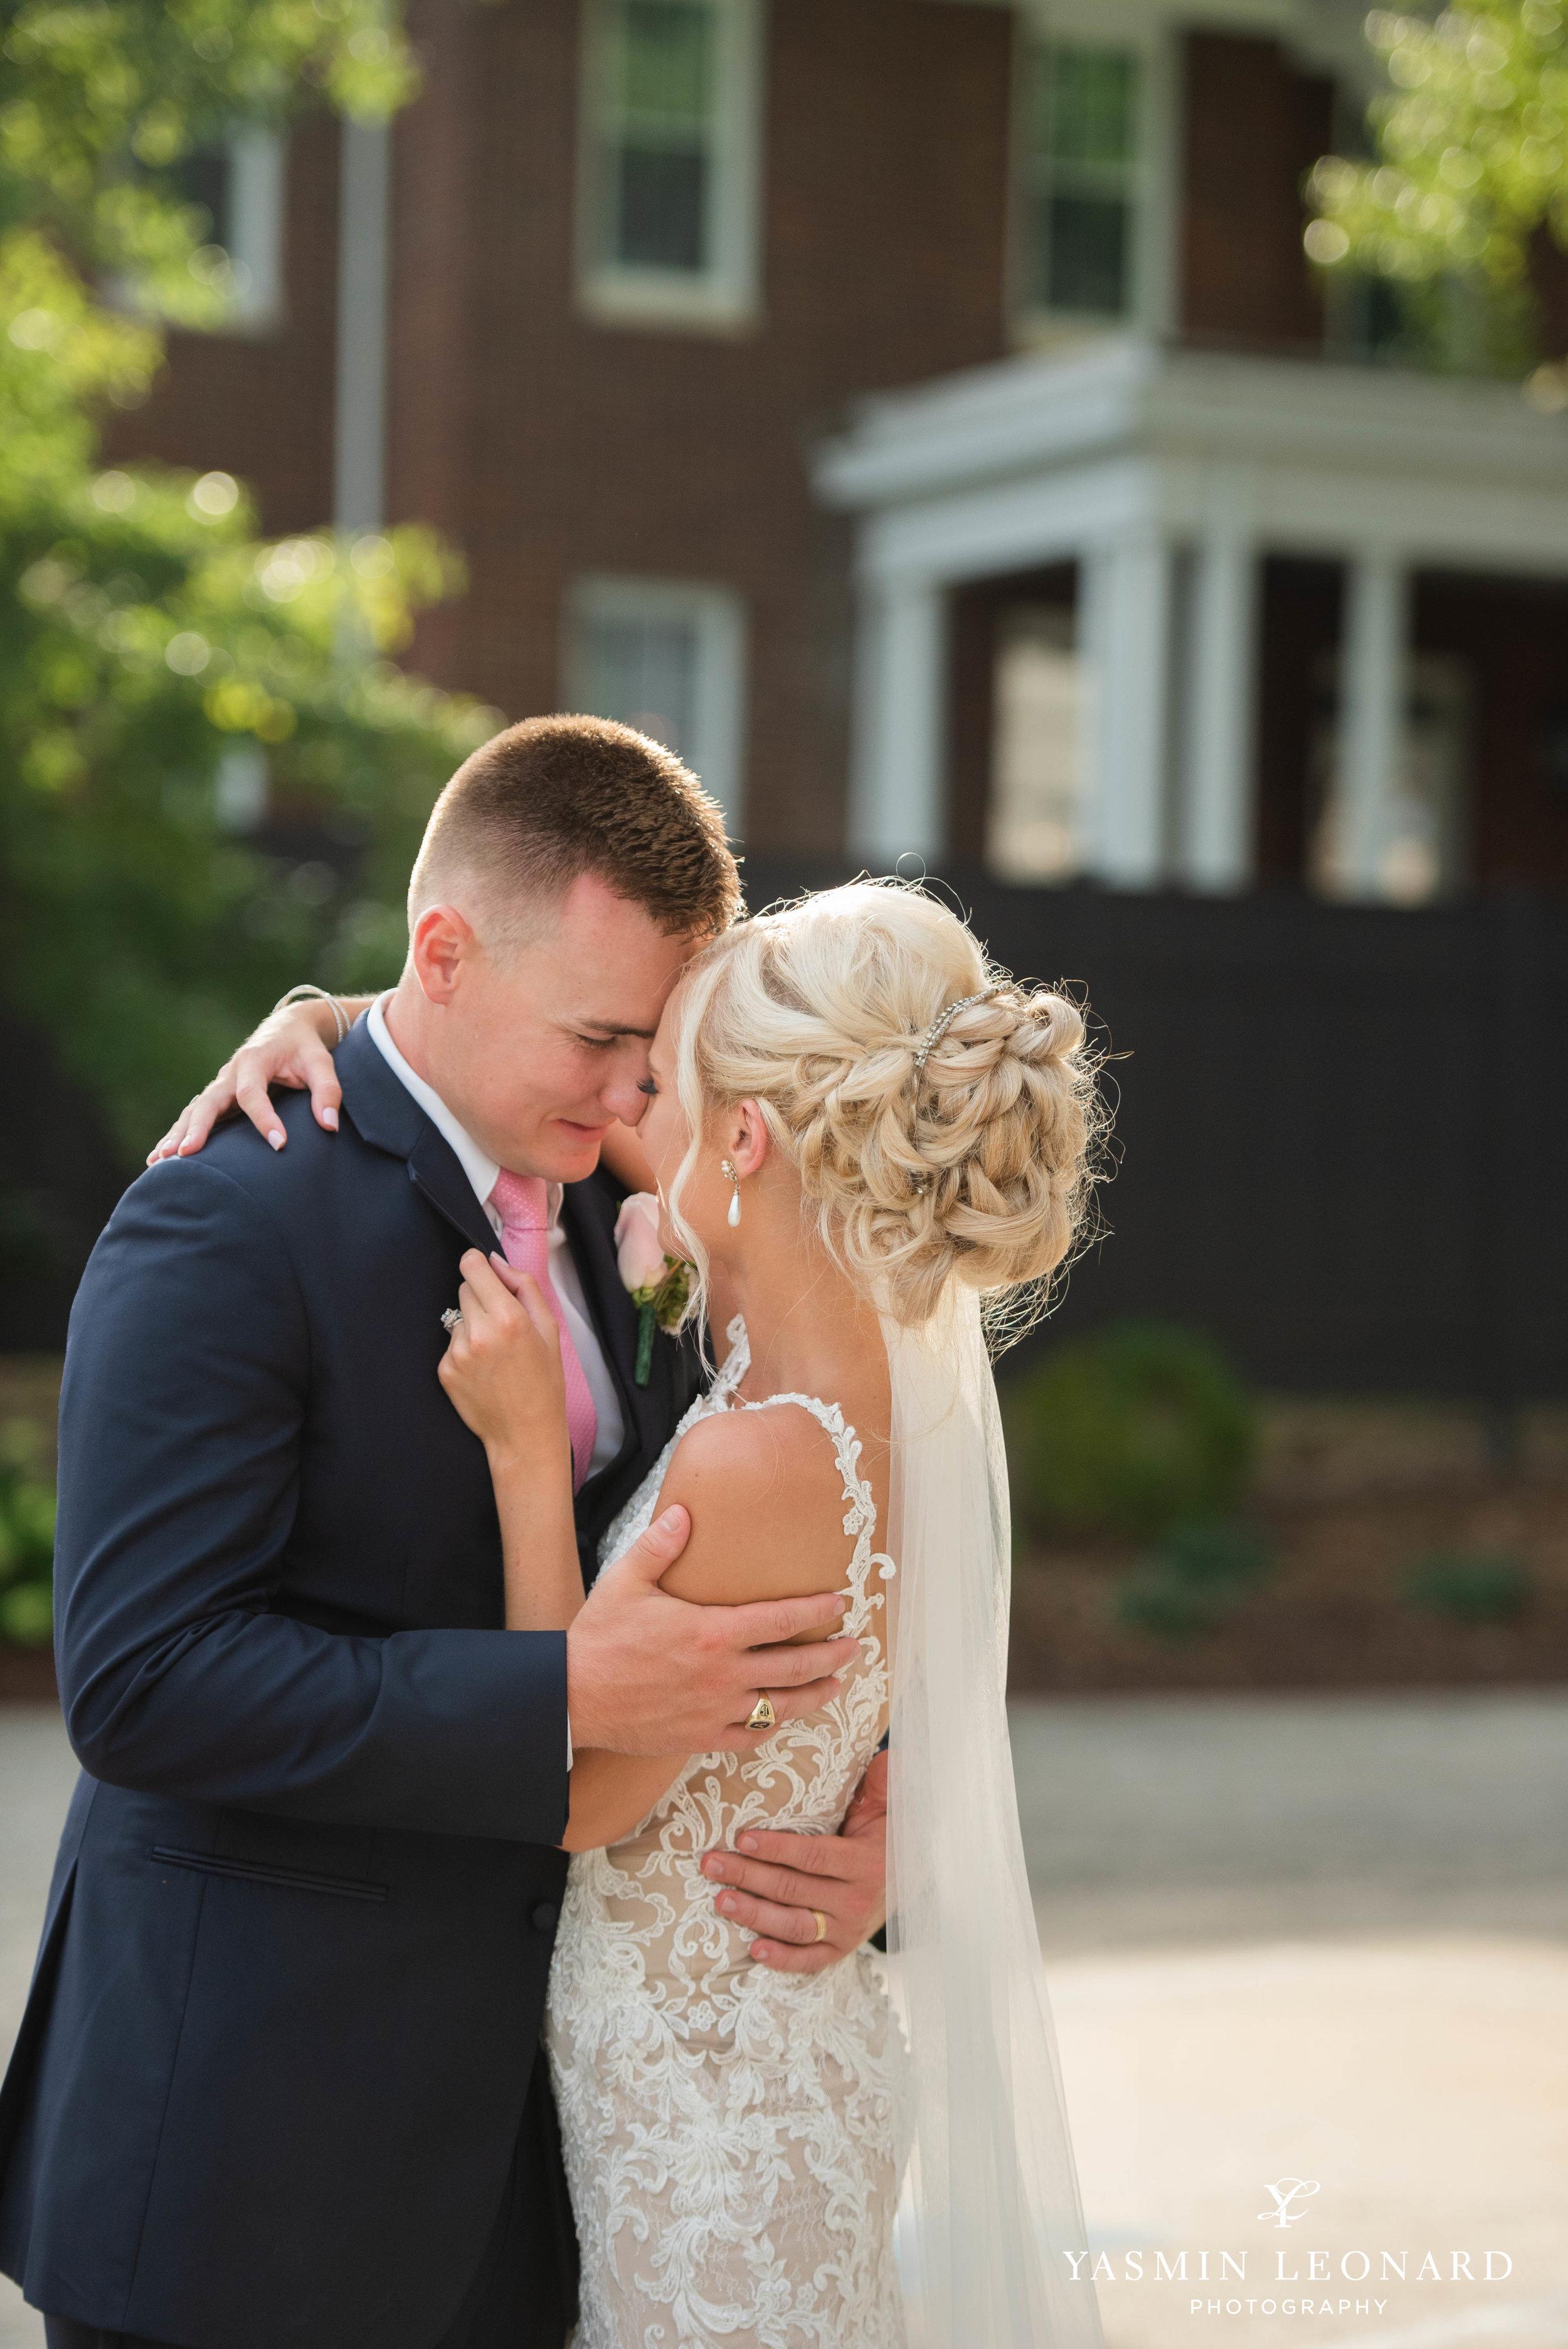 Separk Mansion - NC Weddings - Gastonia Wedding - NC Wedding Venues - Pink and Blue Wedding Ideas - Pink Bridesmaid Dresses - Yasmin Leonard Photography-38.jpg